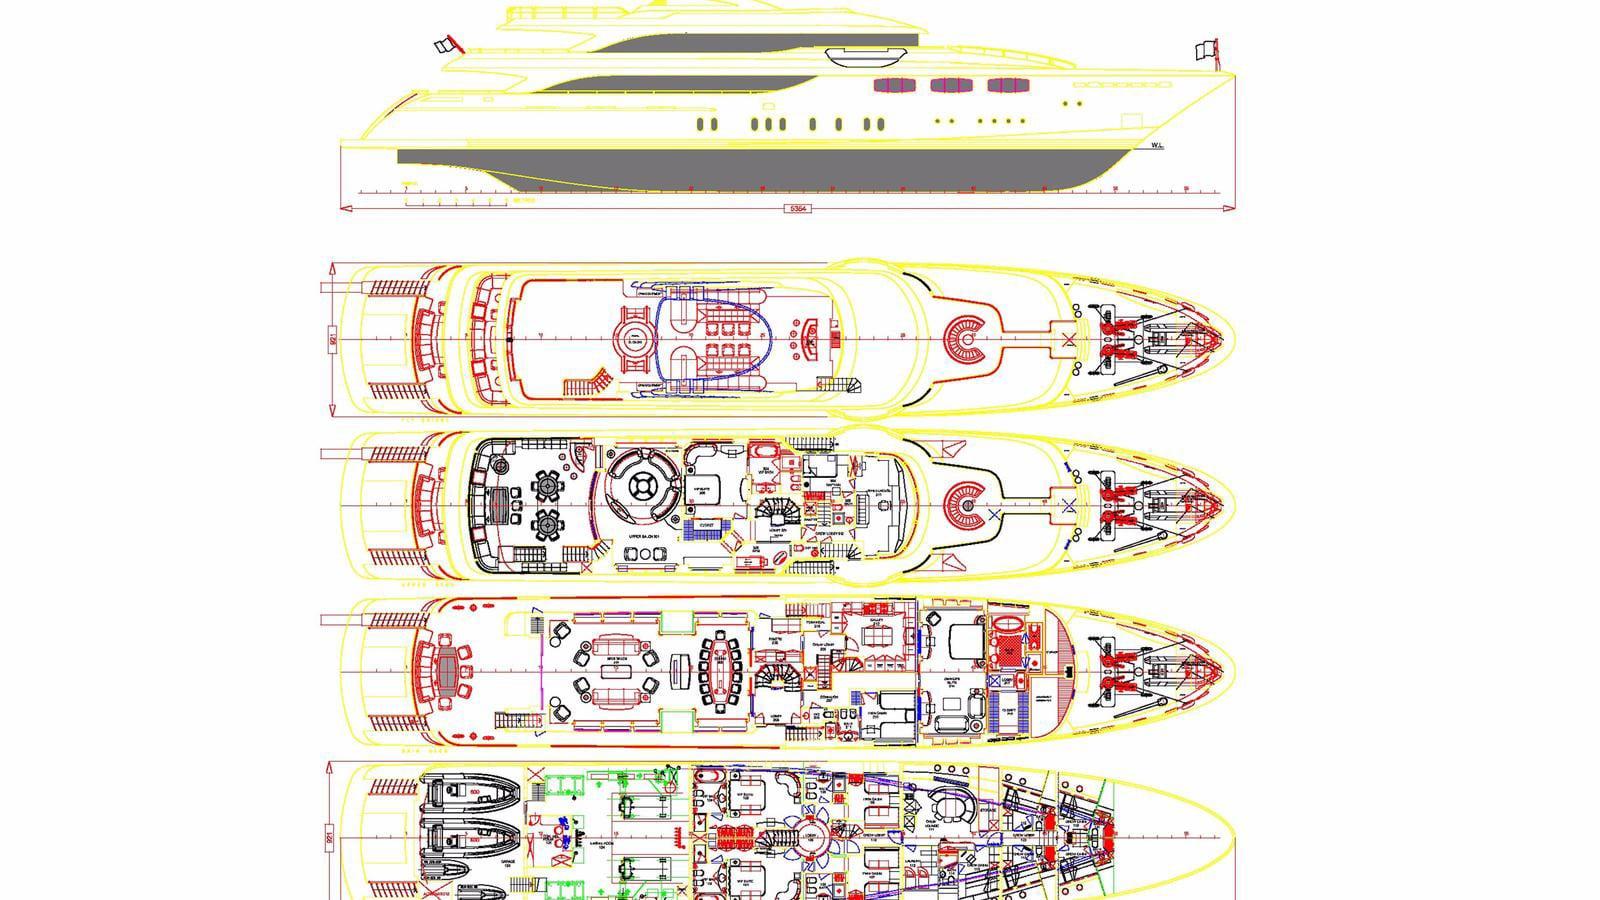 Luxury charter yacht - MIA RAMA -54m - Golden Yachts